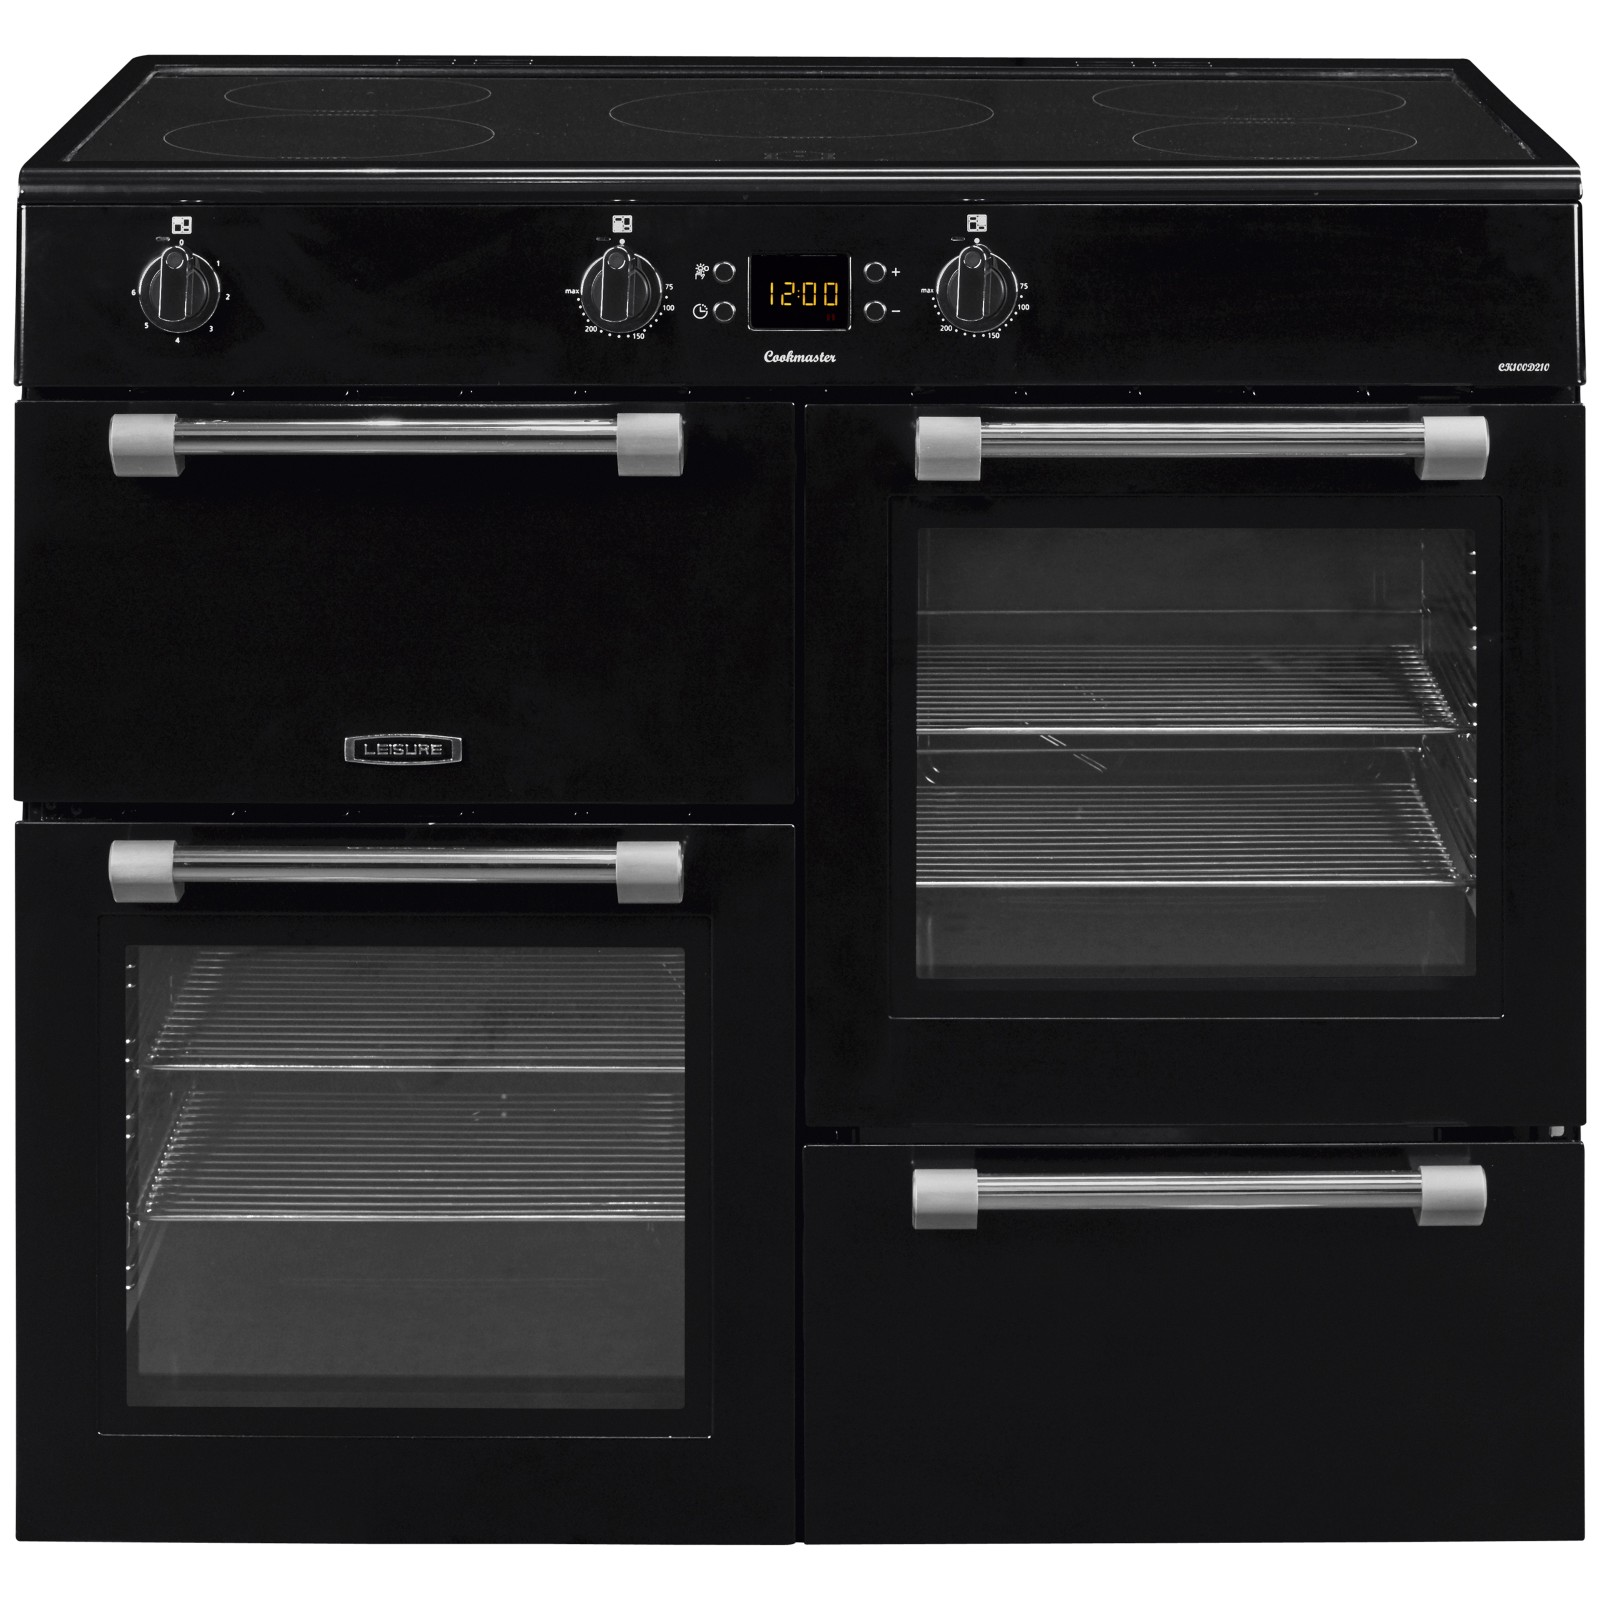 Leisure Cookmaster CK100D210K Freestanding Electric Range Cooker